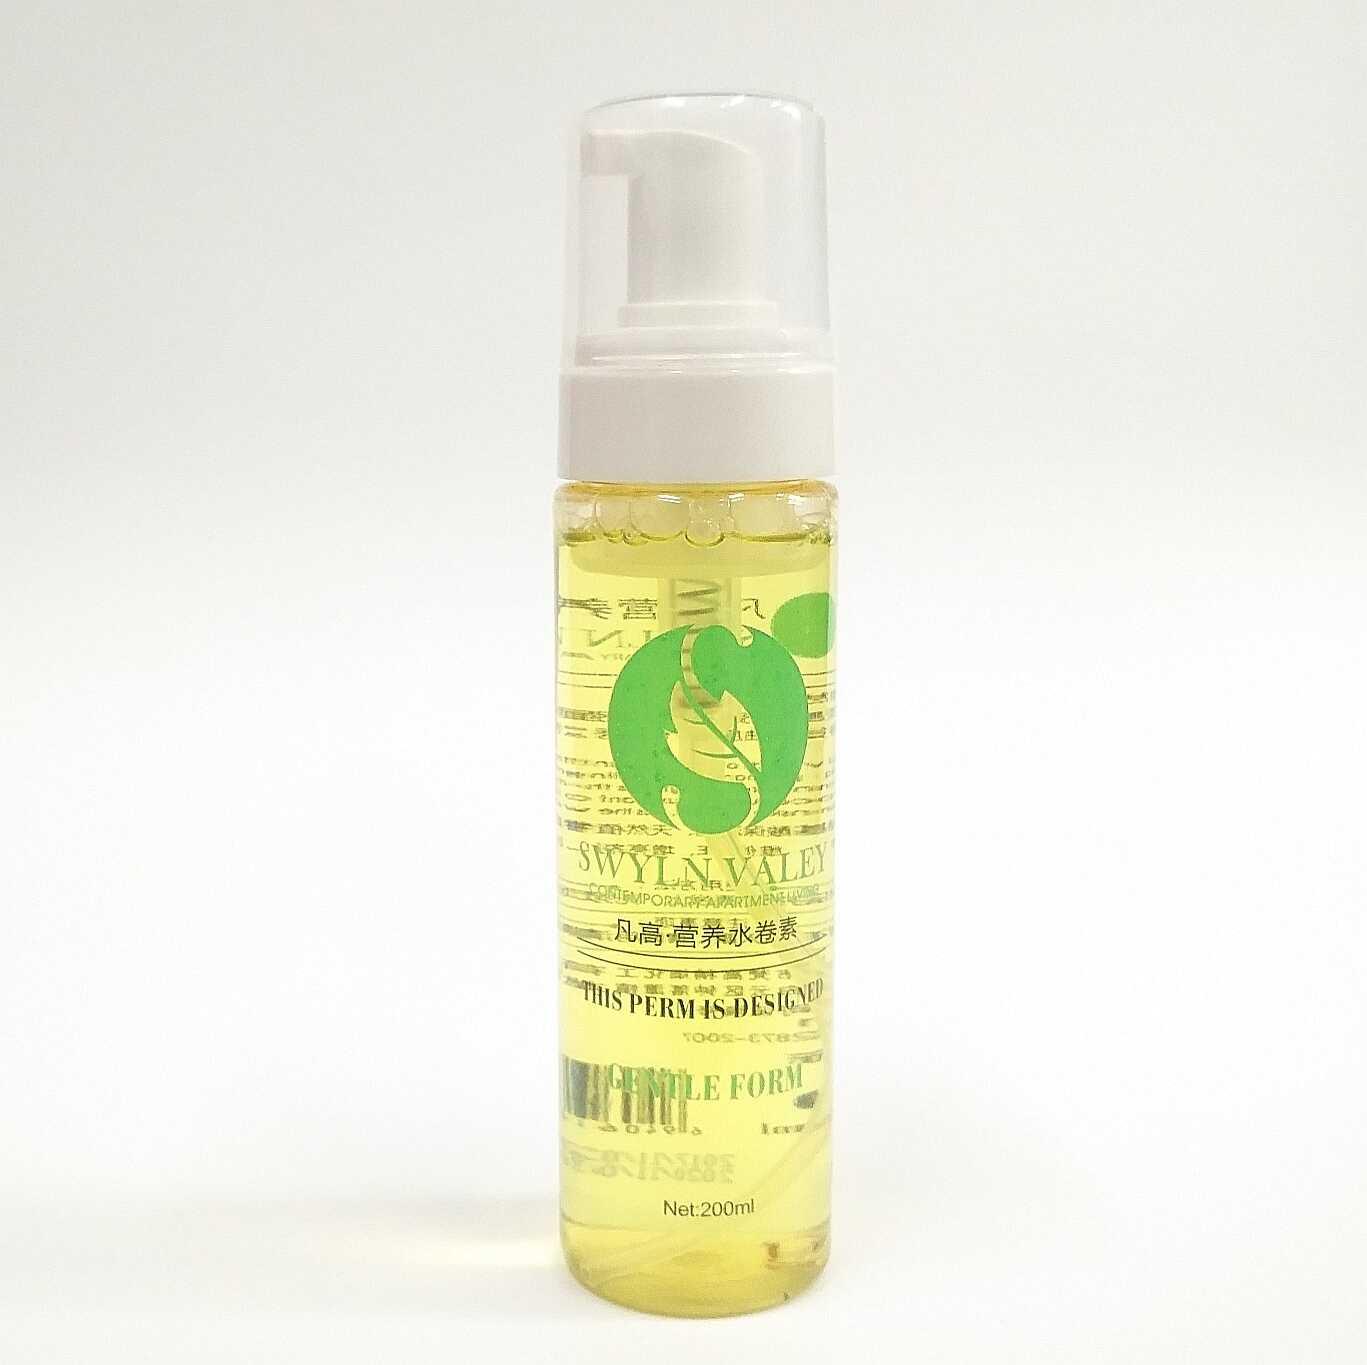 Van Gogh nutrition moisture curable, curling hair styling, bubble carving, elastic foam gel, water mousse, mousse